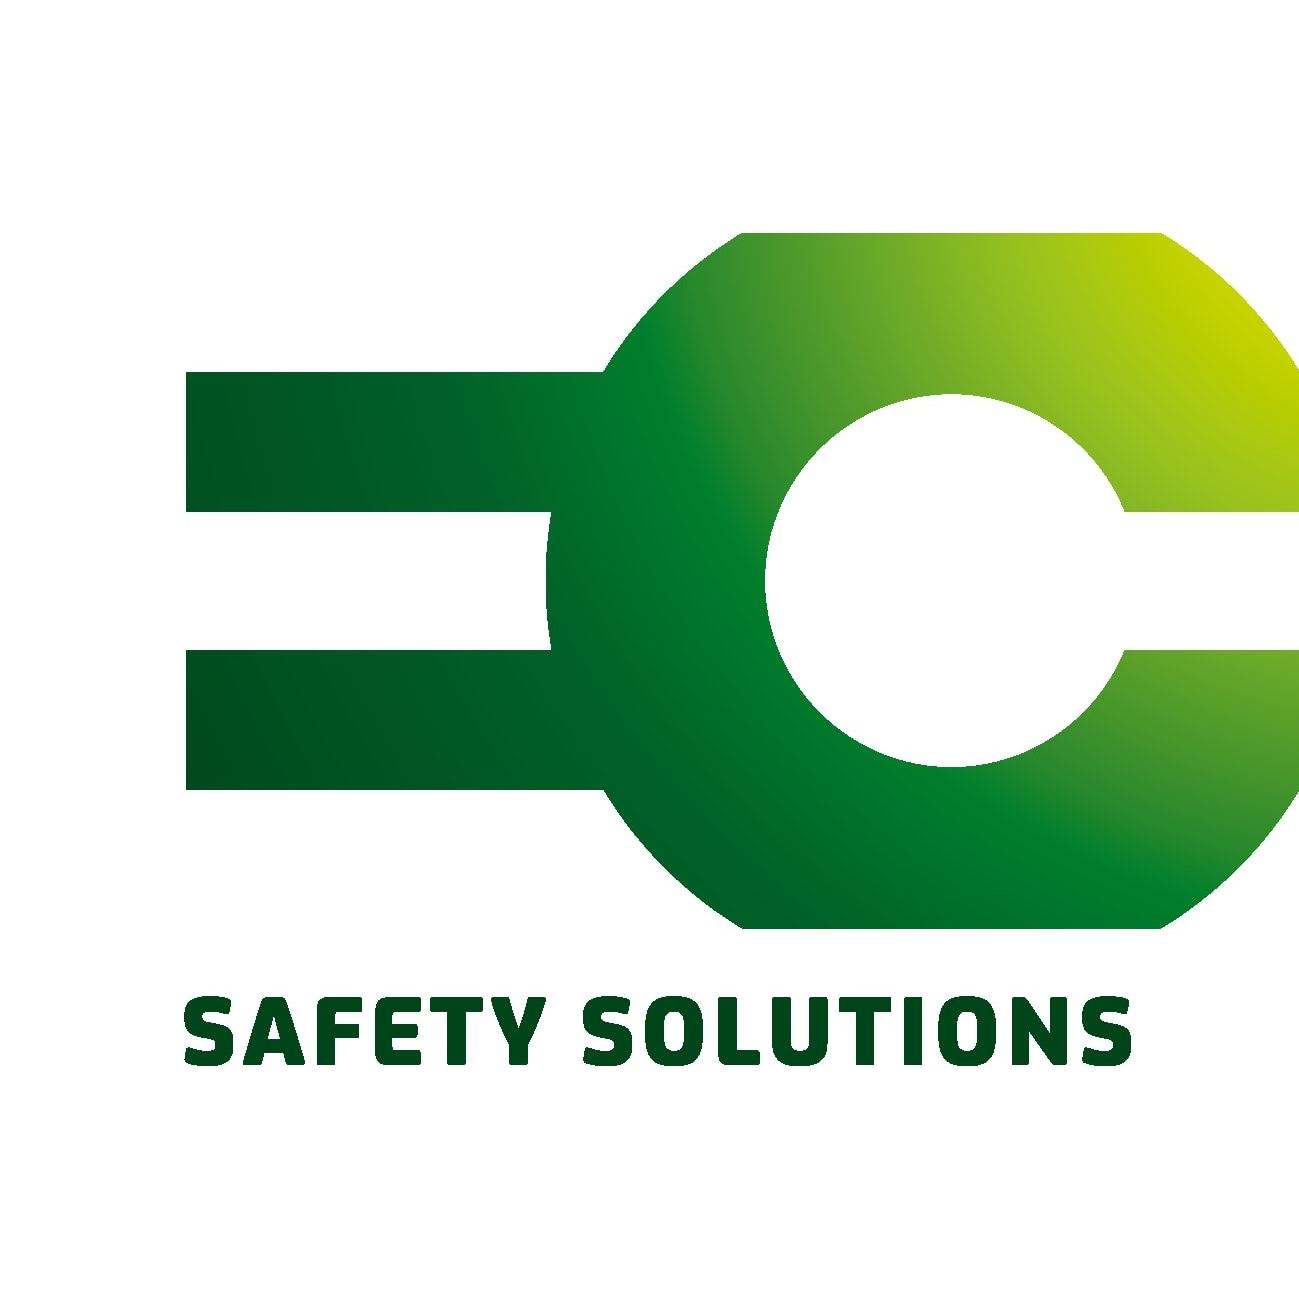 E C Safety Solutions Ltd